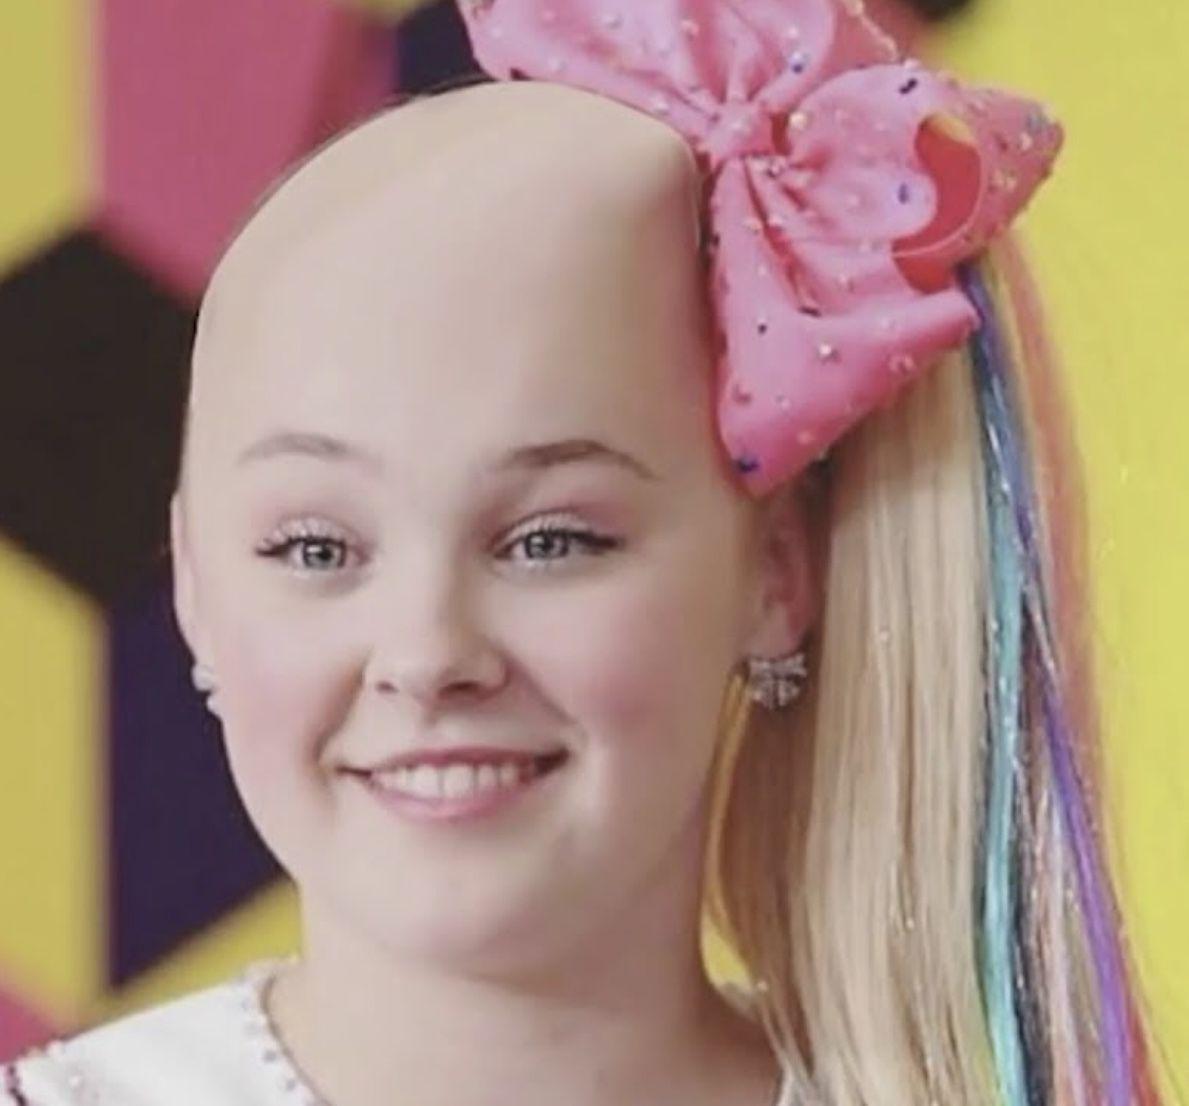 Jojo Tour Dates 2020 Jojo Siwa's hairline by 2020 | Tumblr Dump | Hairline jokes, Jojo